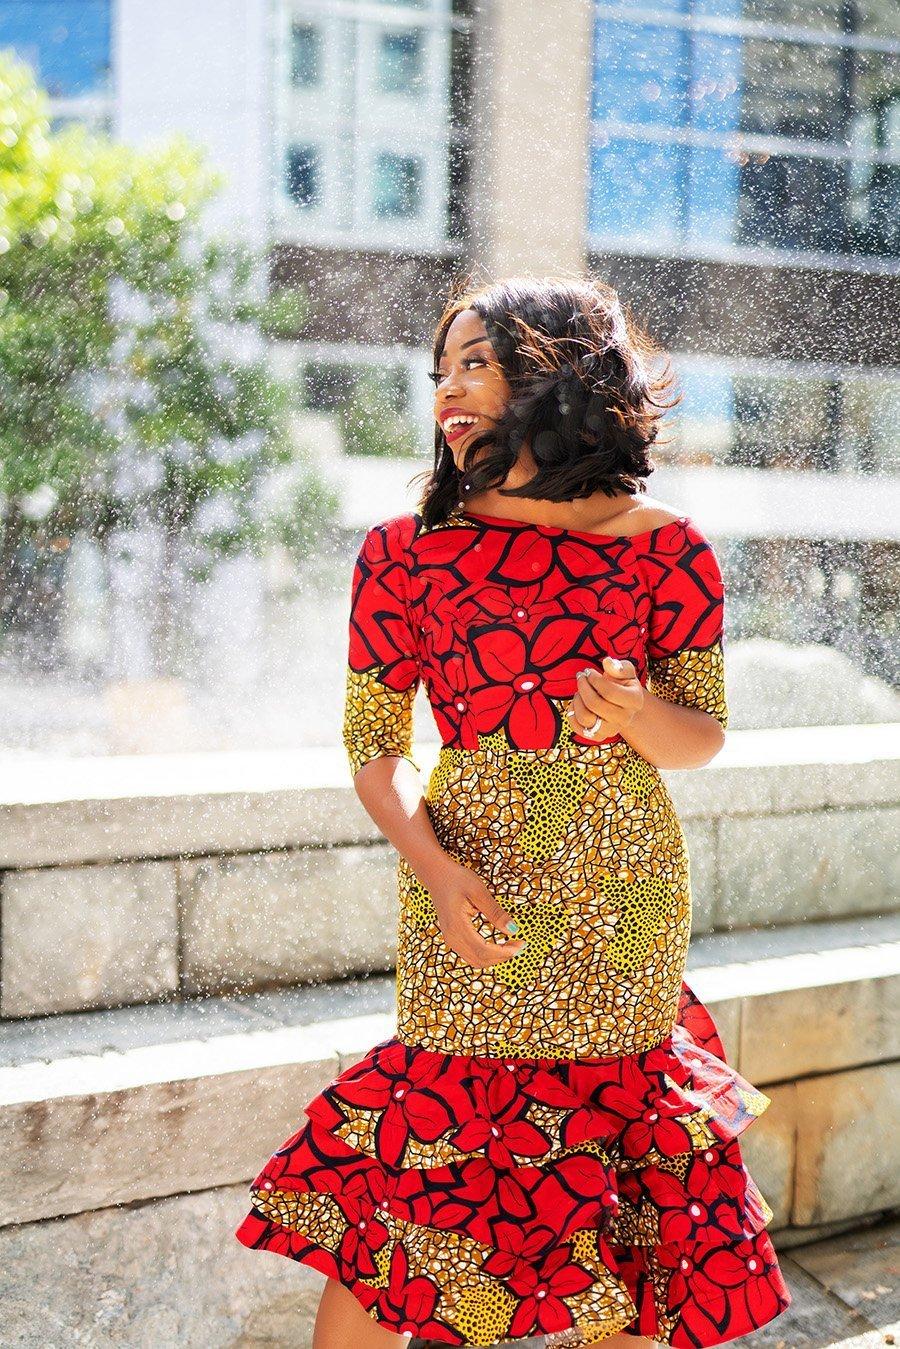 Stella-Adewunmi-of-Jadore-Fashion-shares-her-ankara-off-shoulder-dress